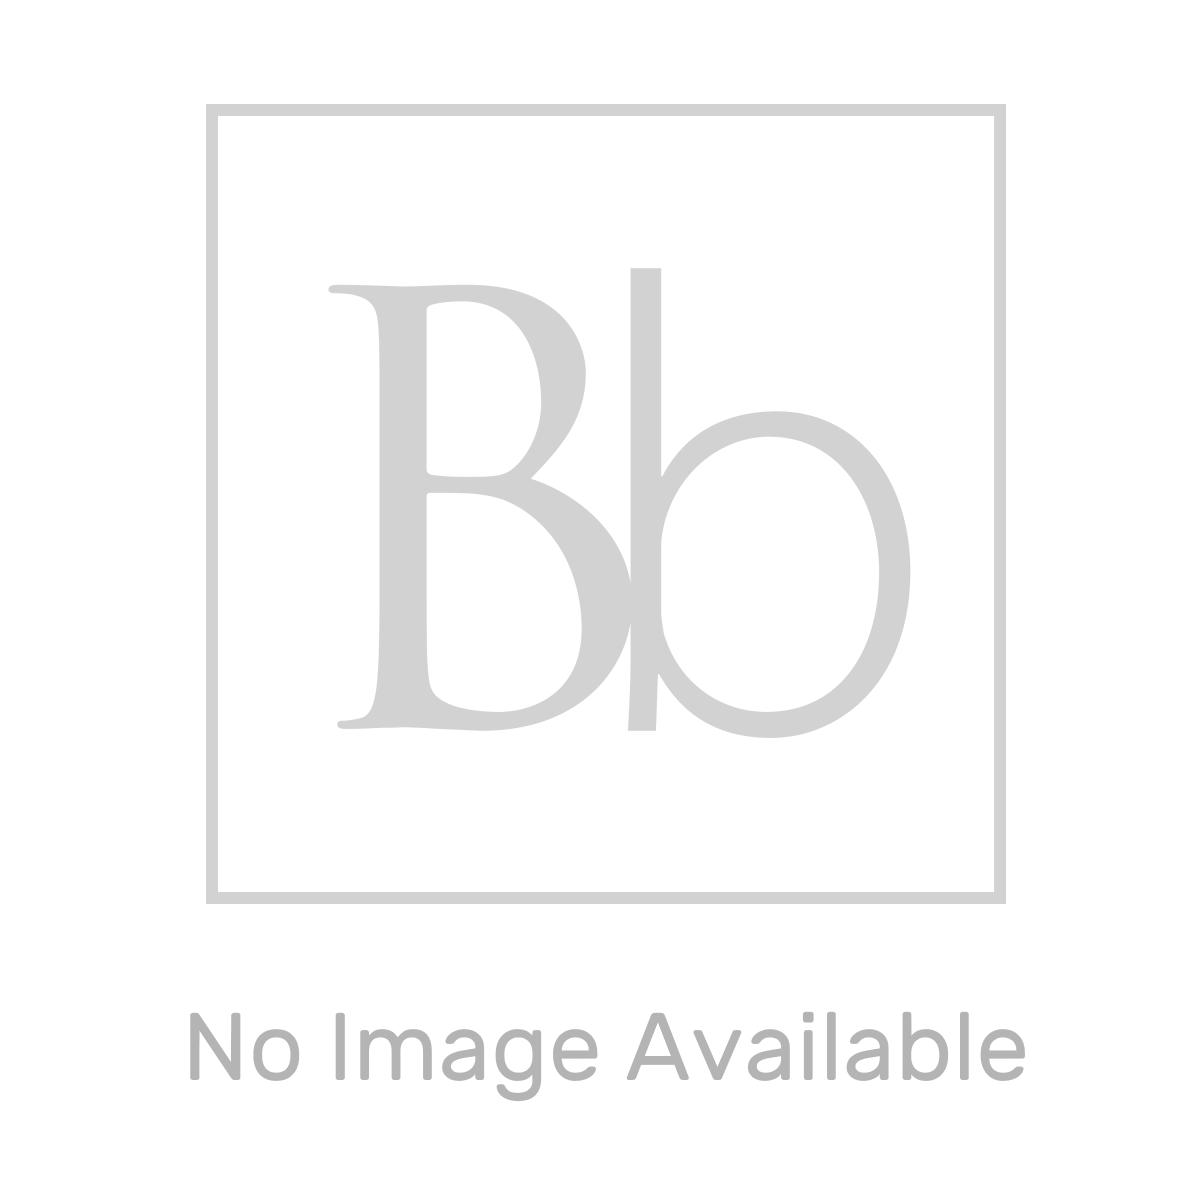 RAK Surface Matt Ash Tile 300 x 600mm Lifestyle